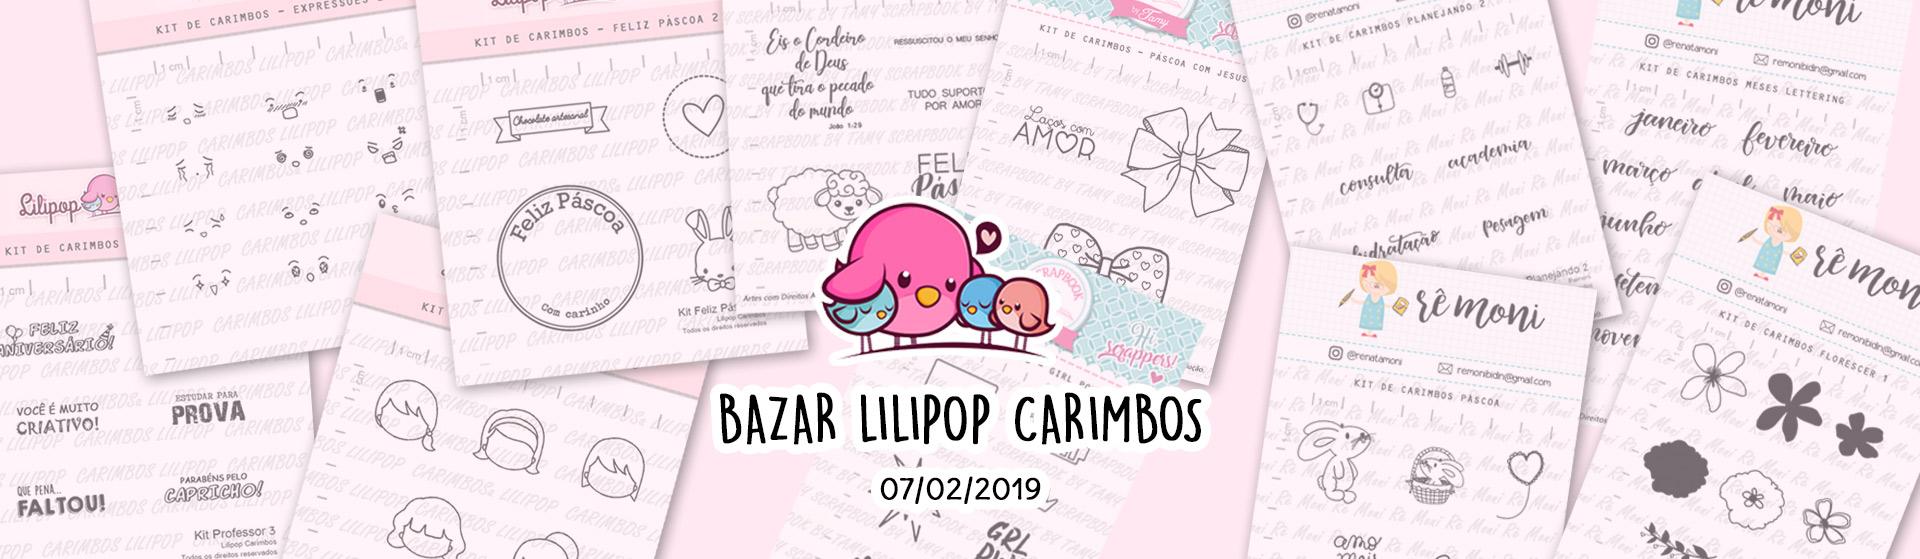 http://www.lilipopcarimbos.com.br/carimbos